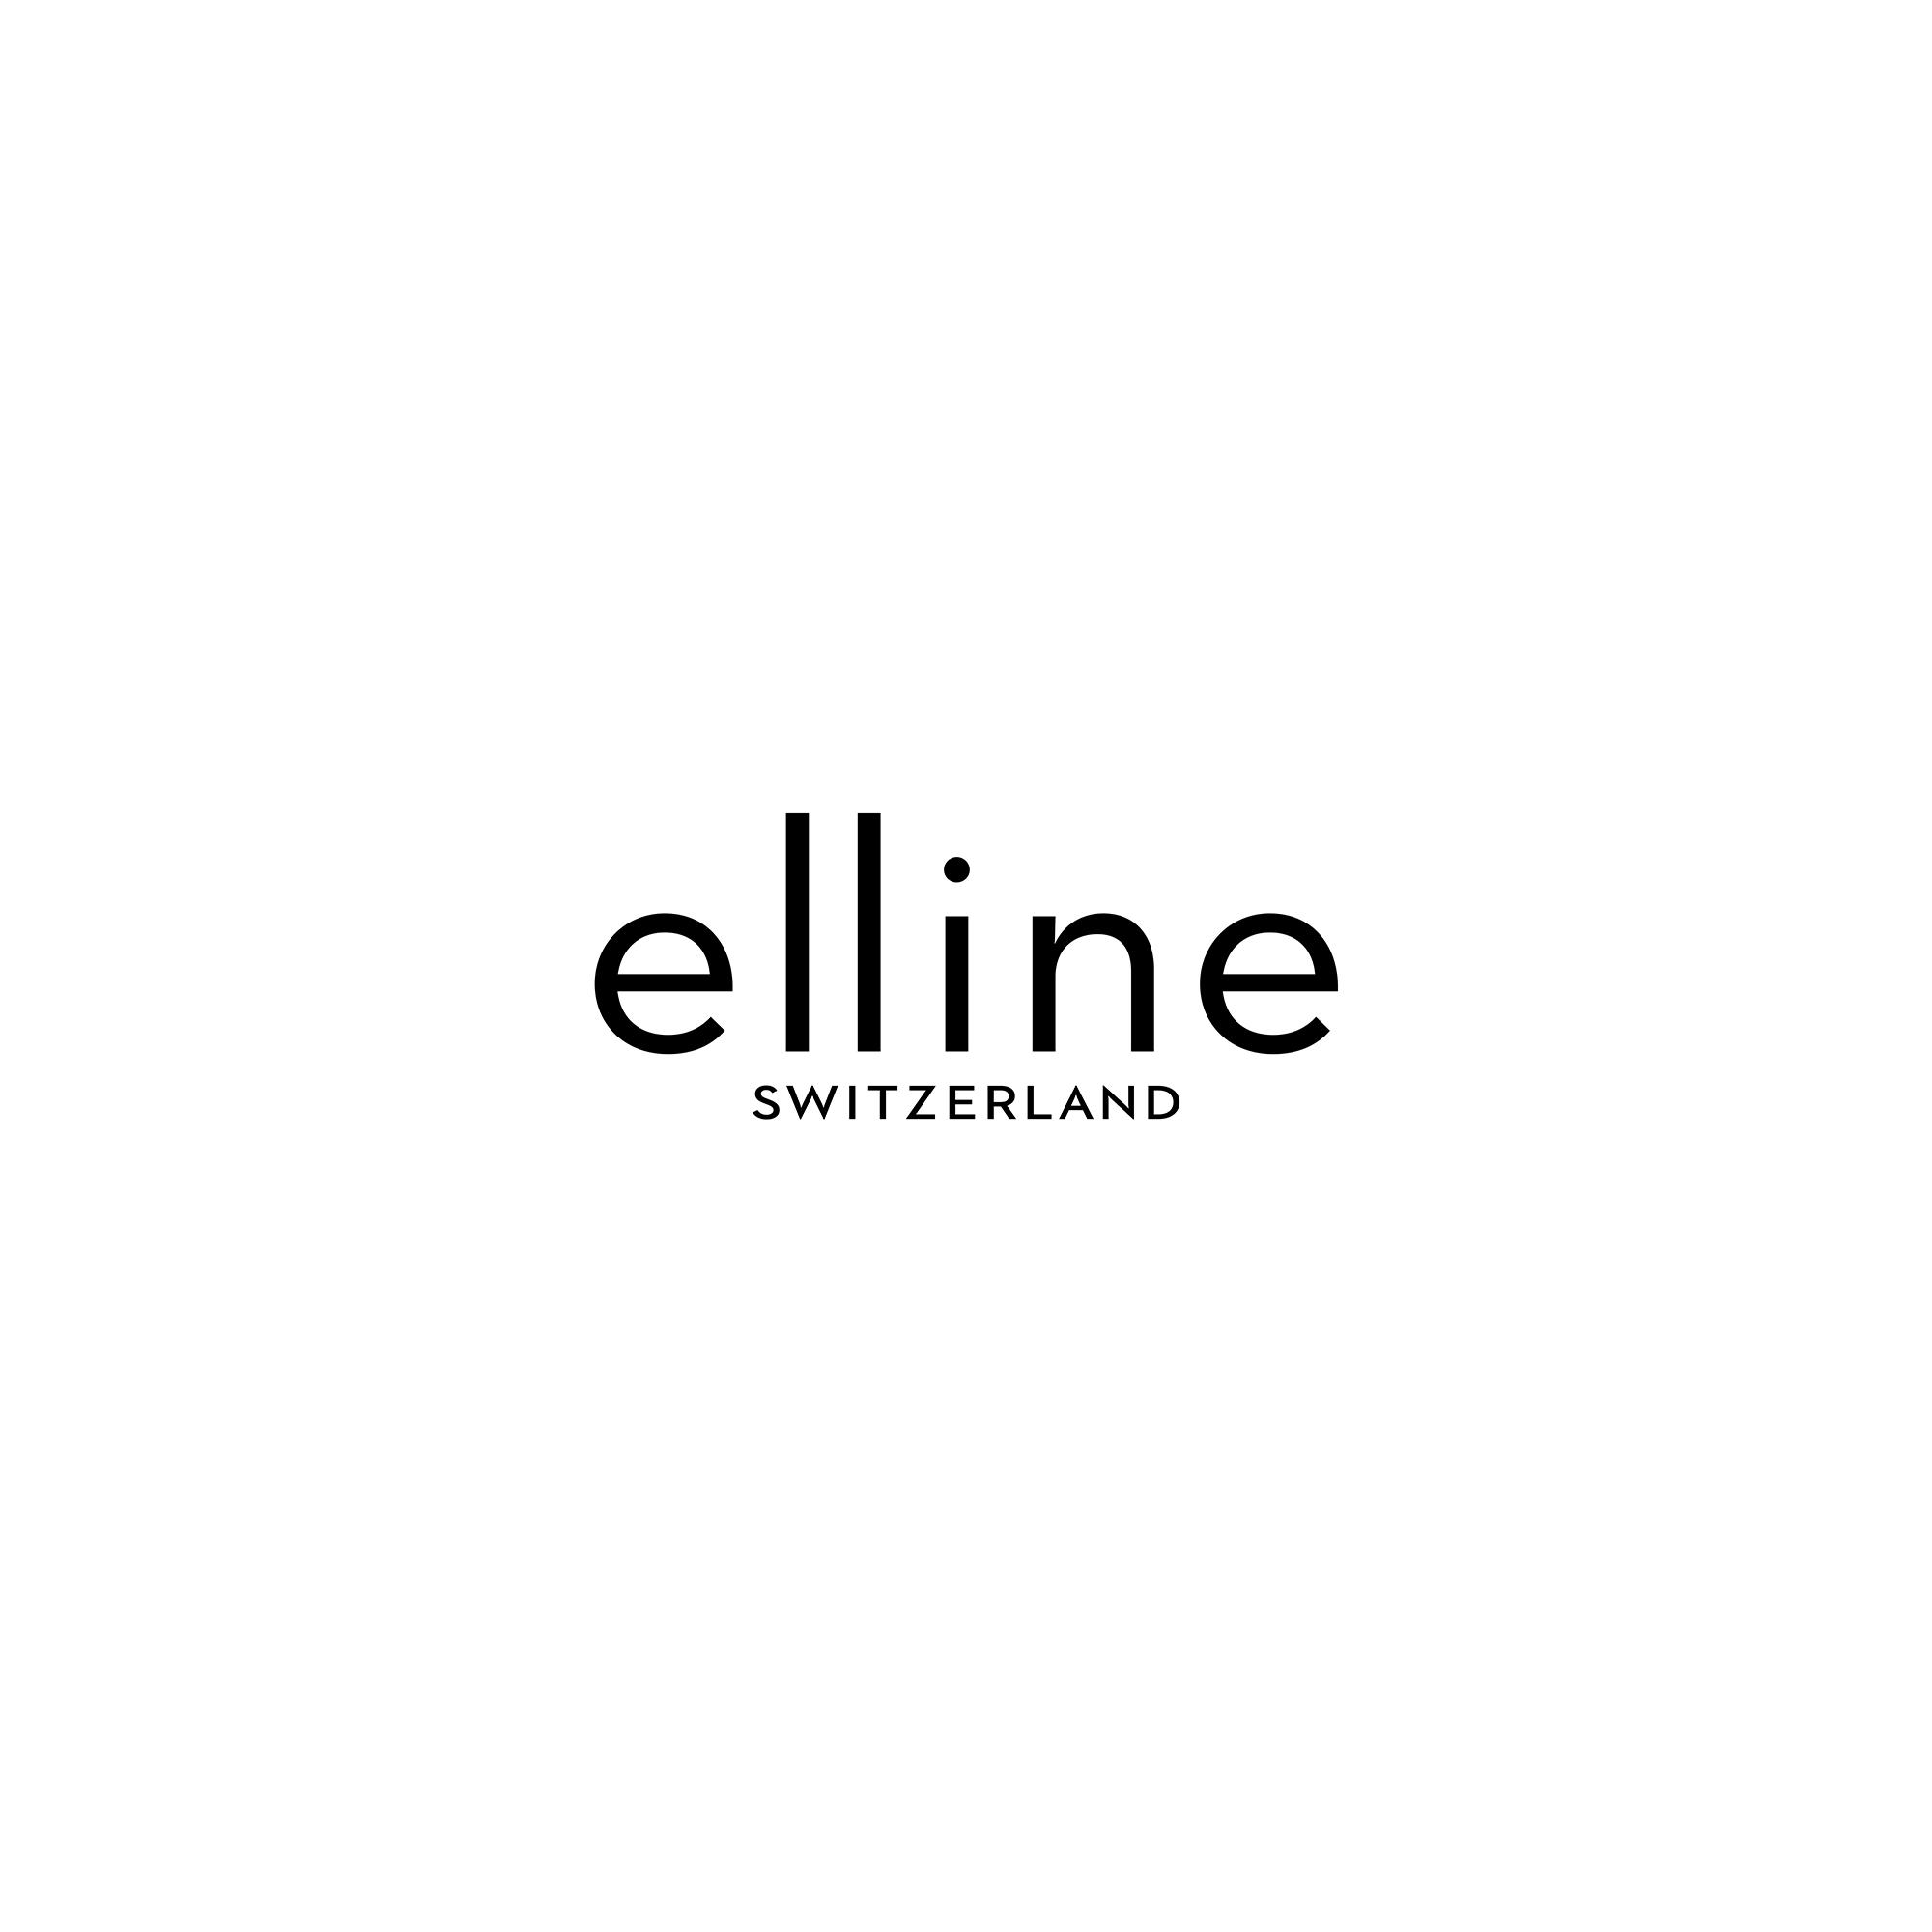 elline 邀你见证超越时间的光美焕变!